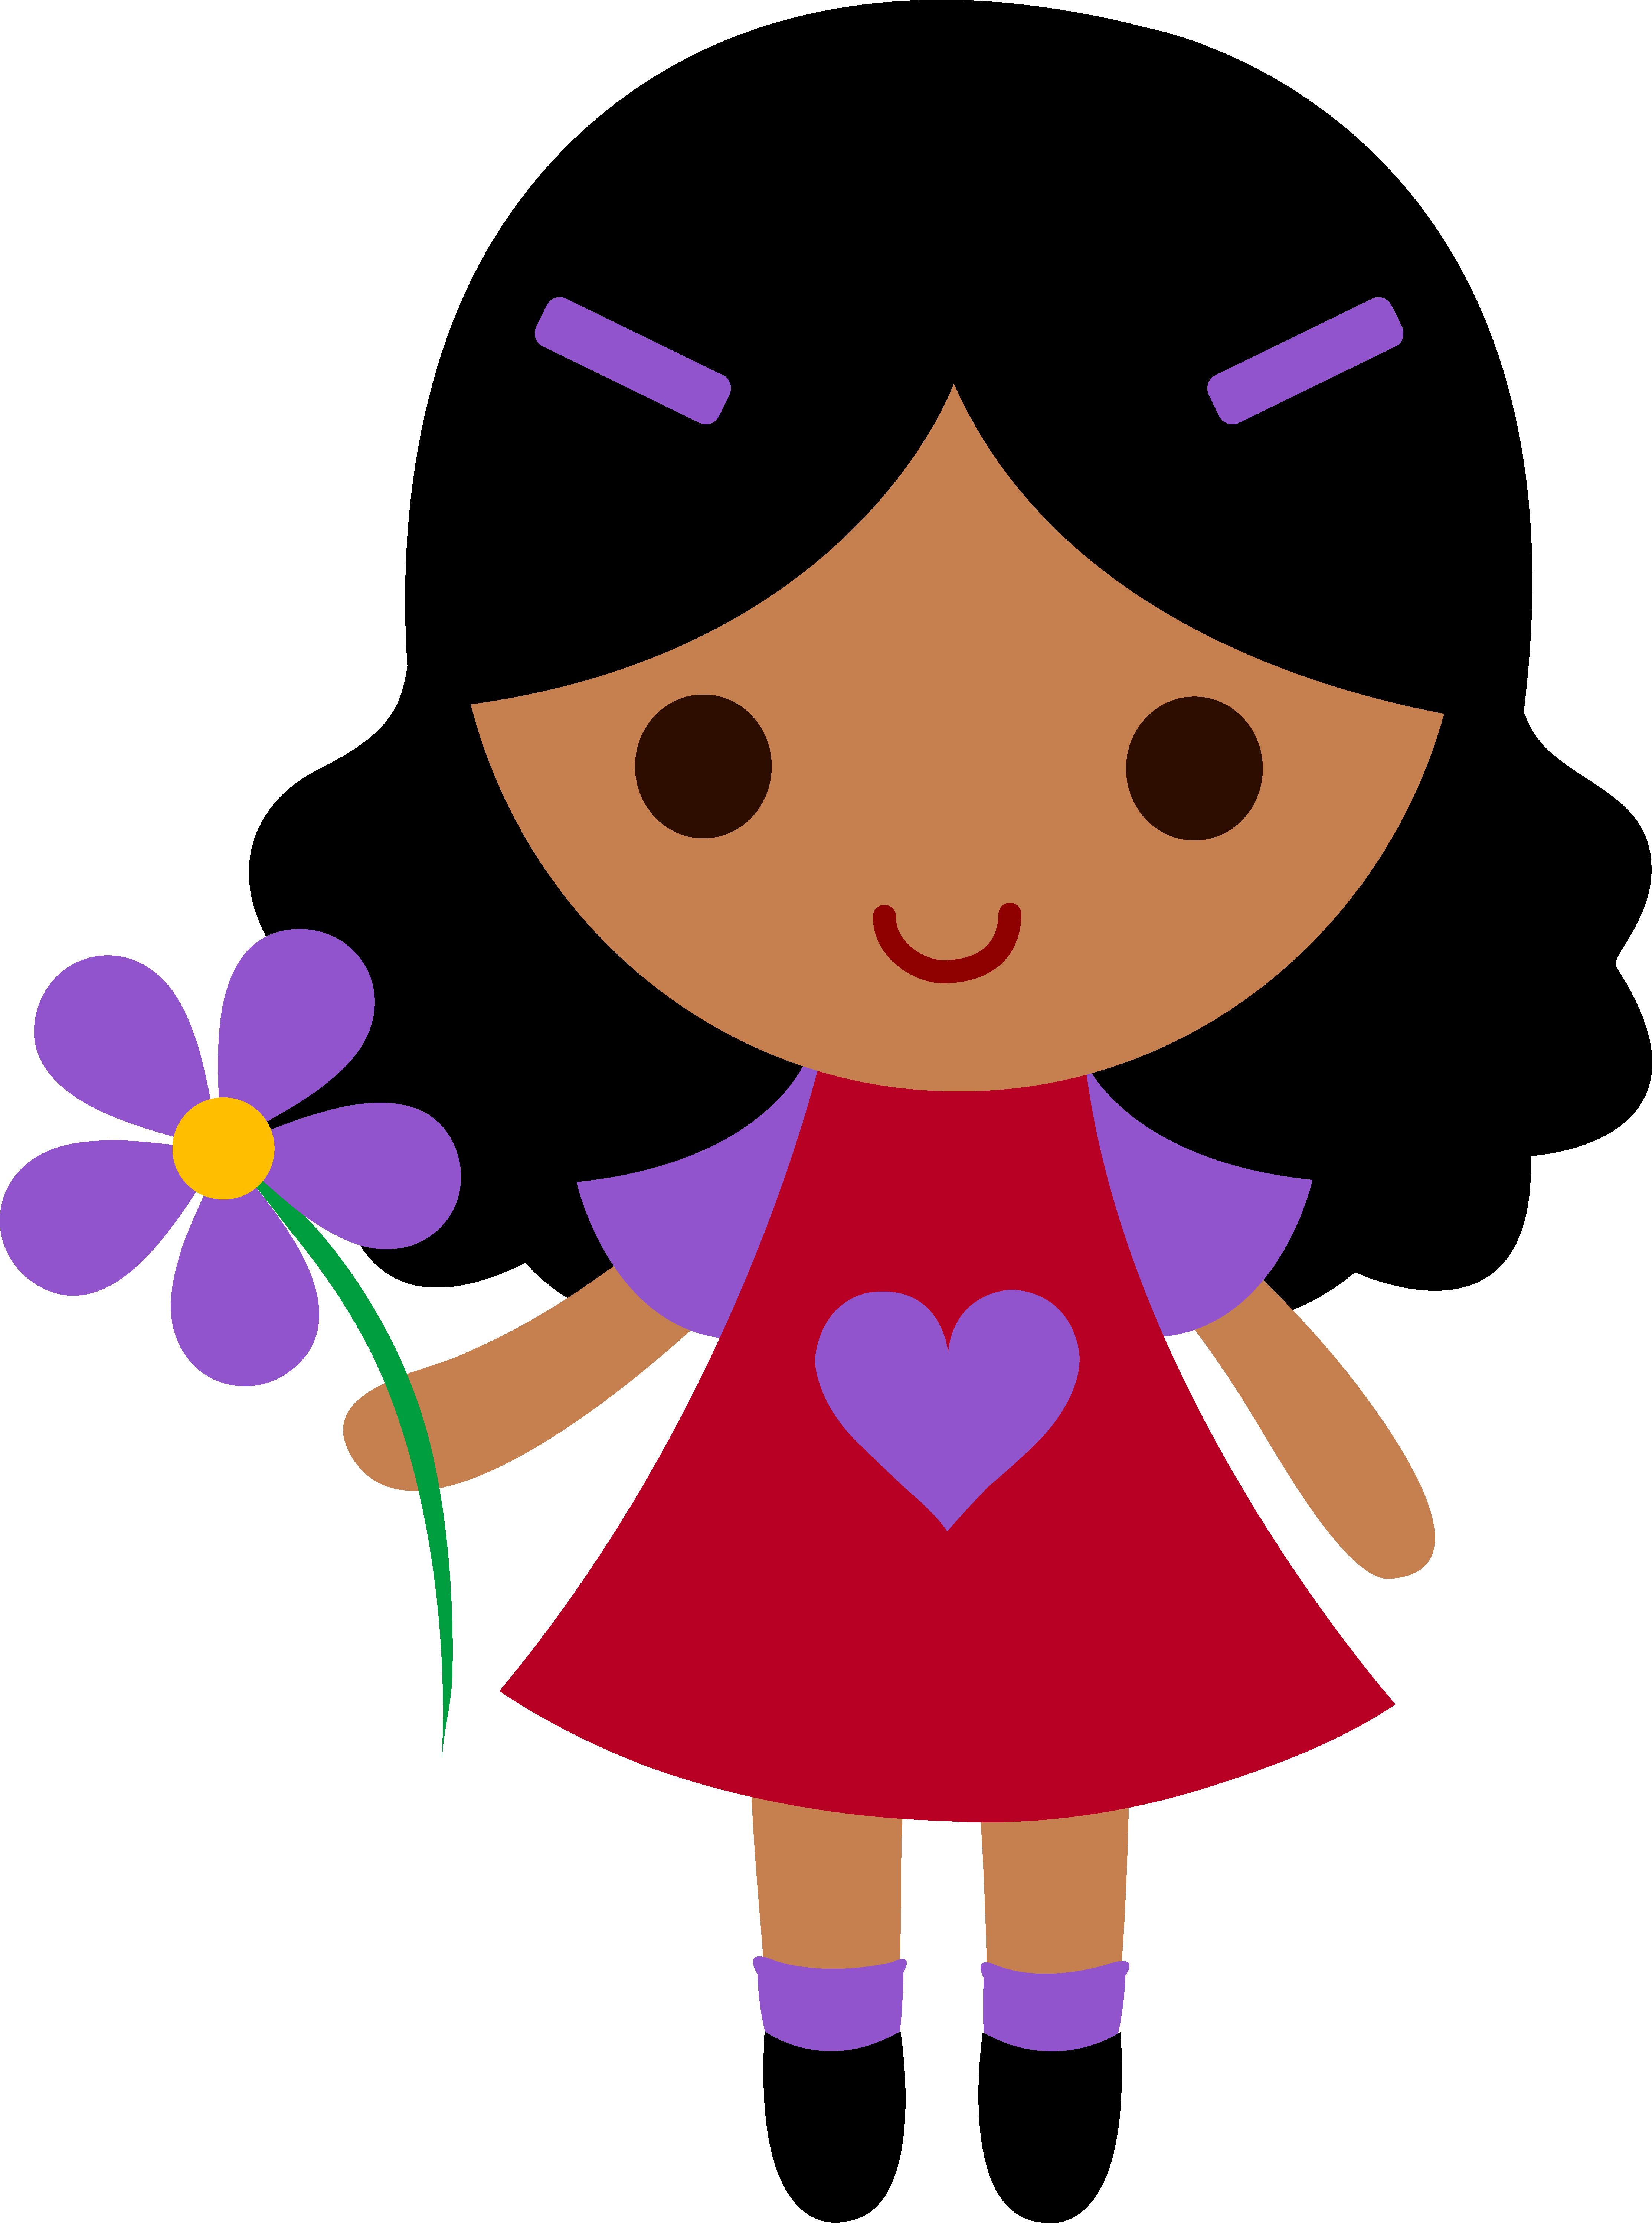 medium resolution of my clip art of a little girl holding a purple flower